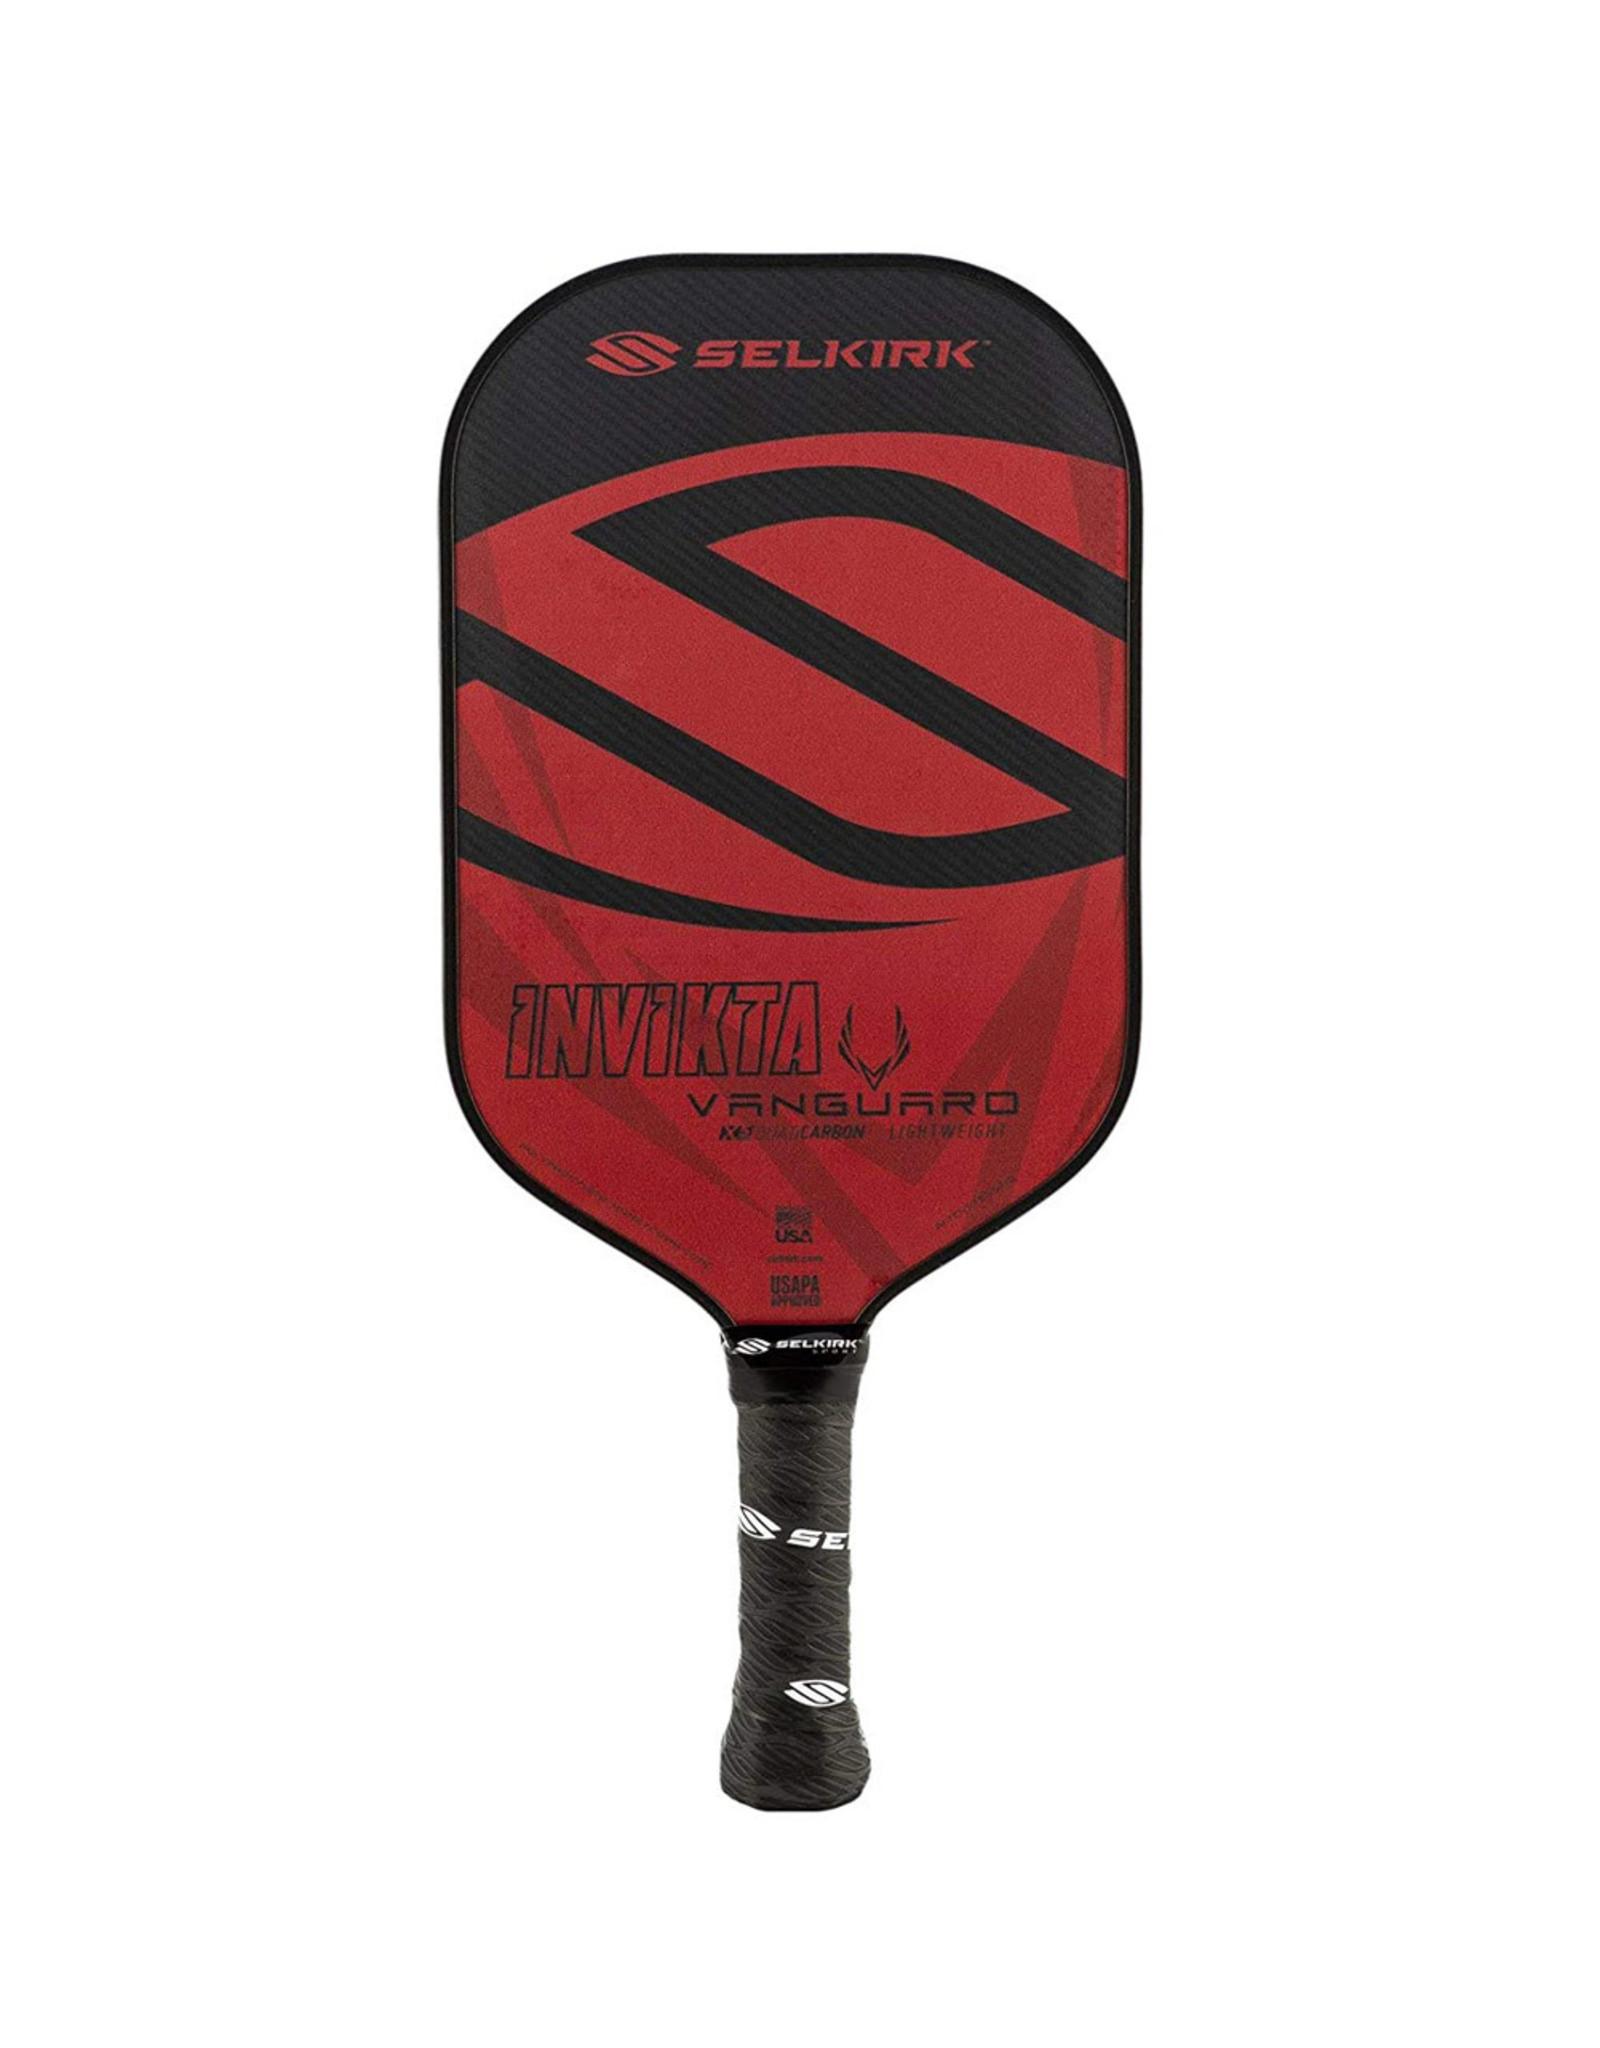 Selkirk Selkirk Vanguard Hybrid Invikta Lightweight Crimson Black